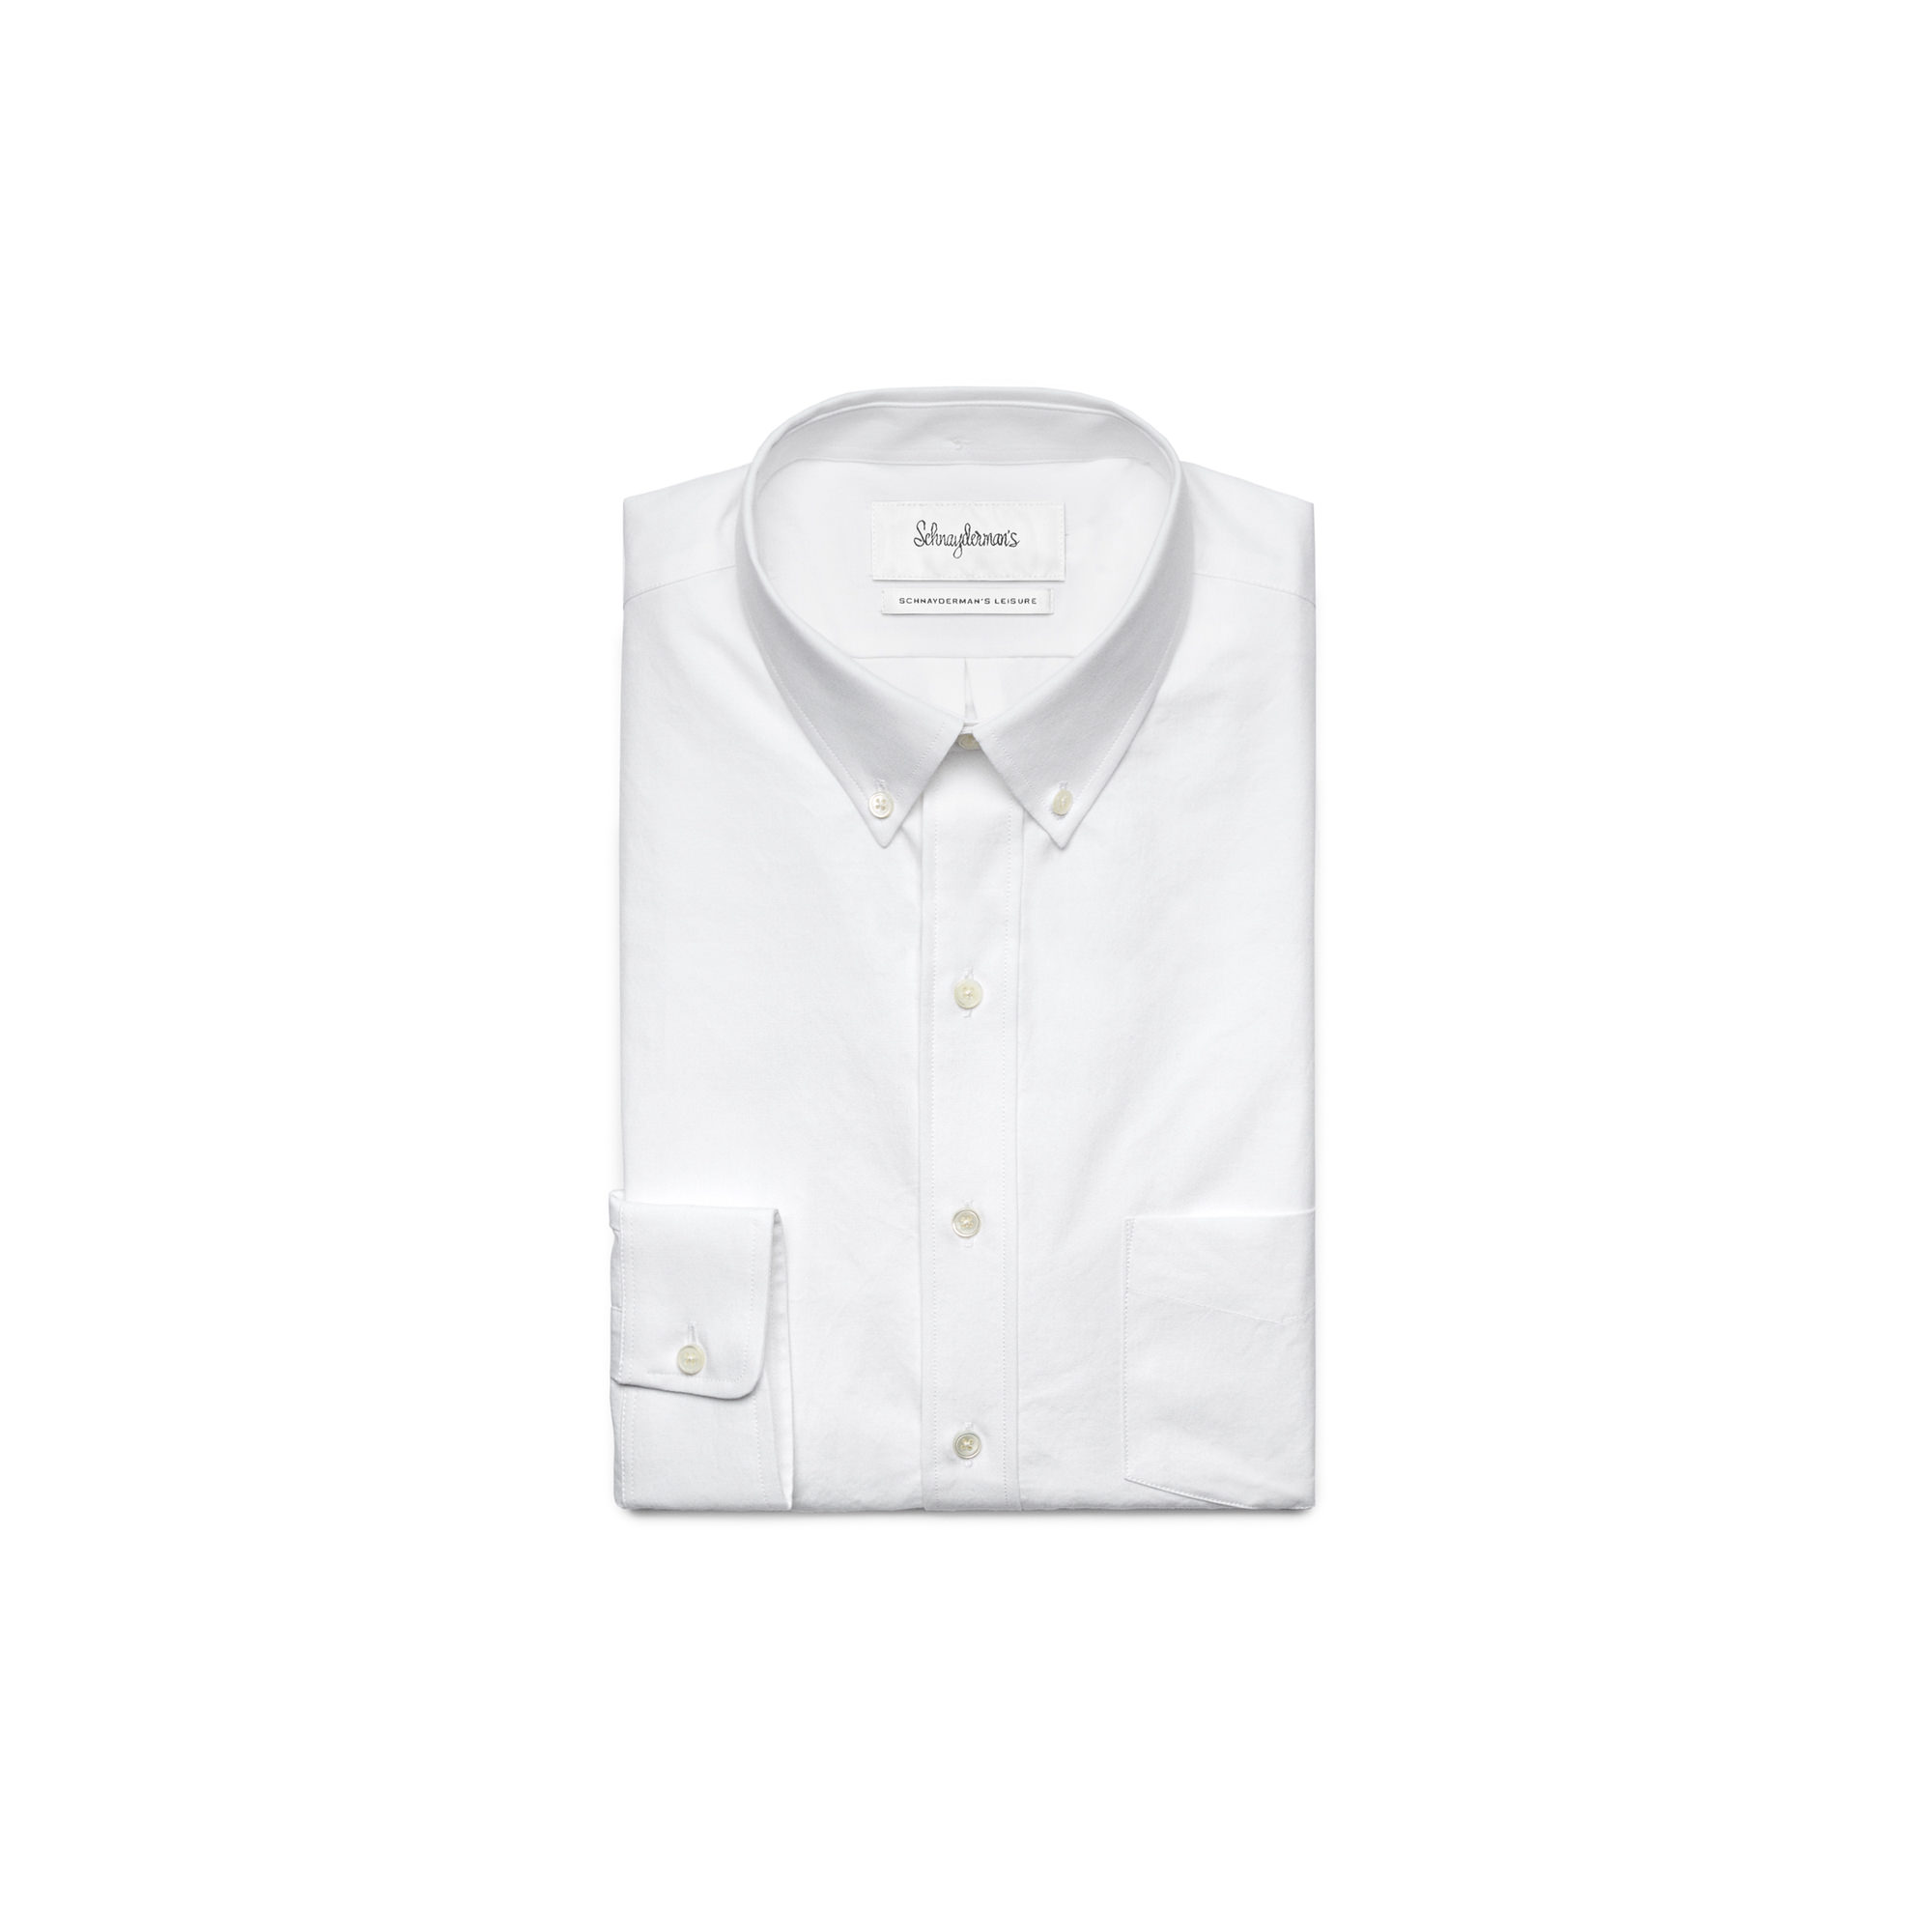 chemise schnaydermans